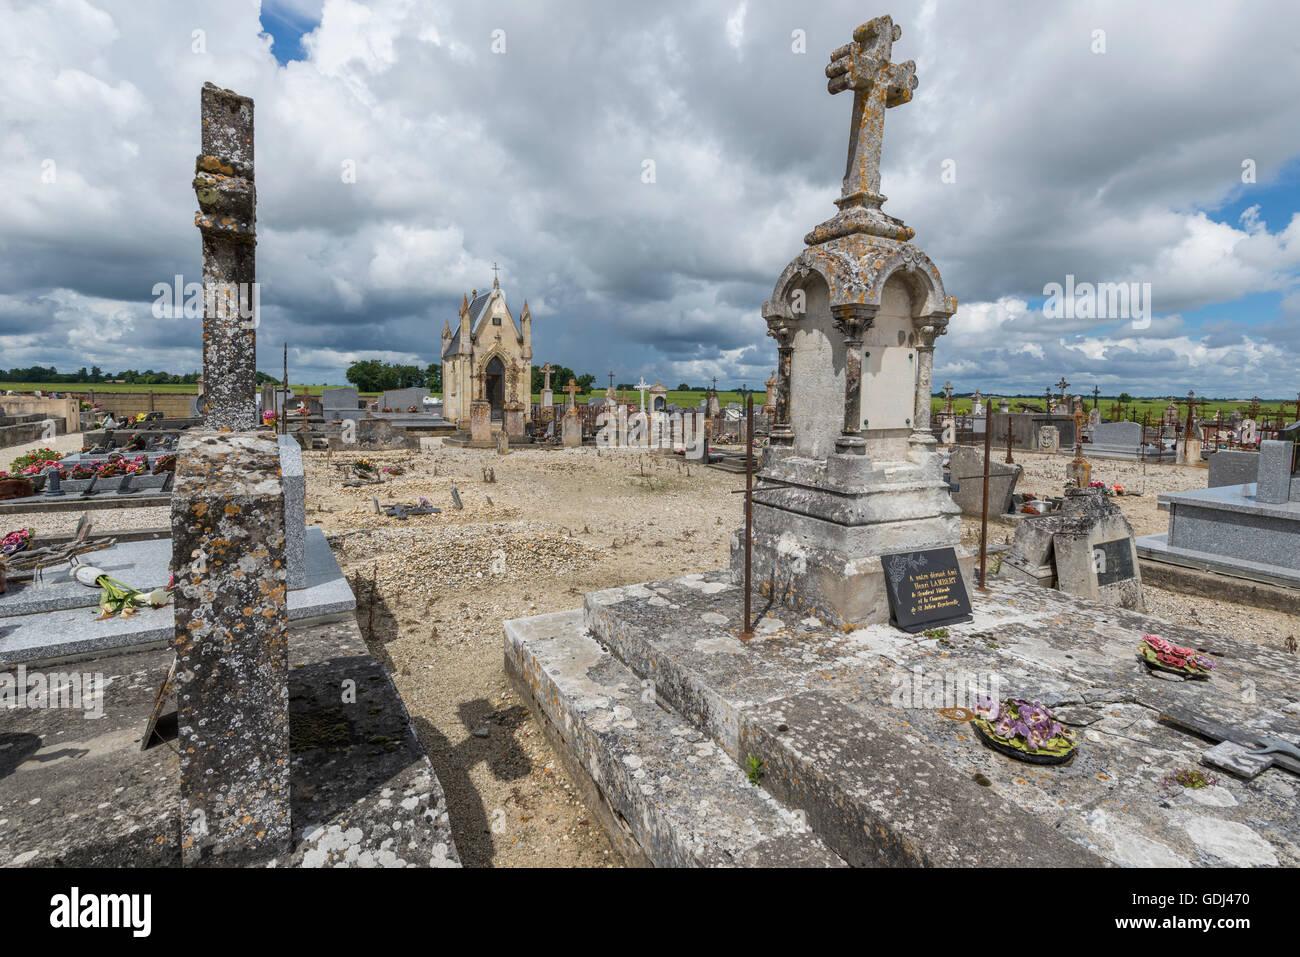 cemetery of Saint Julien, Gironde, France Stock Photo